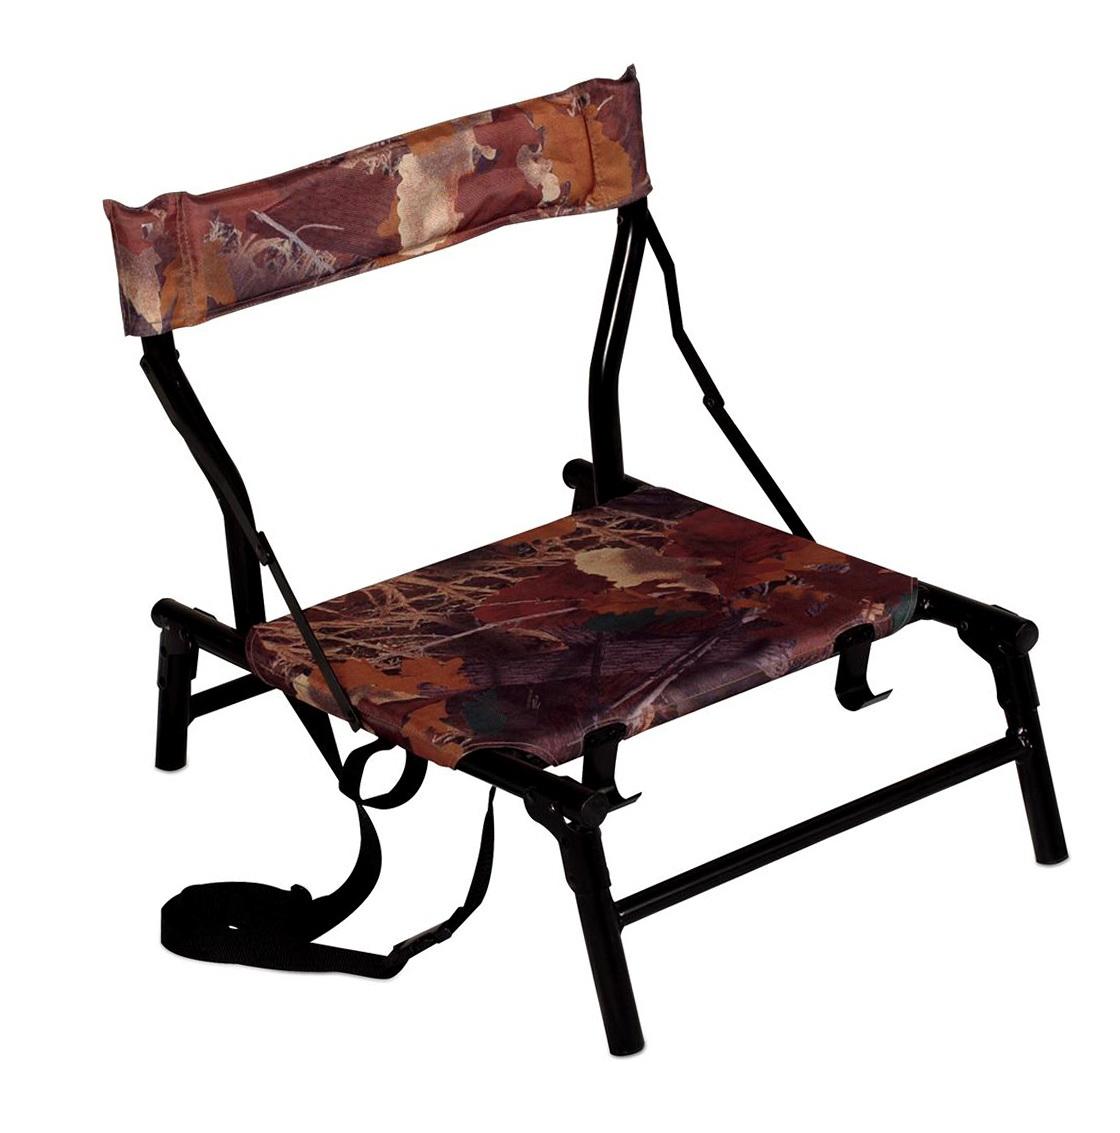 Hot Seat Hunting Cushion